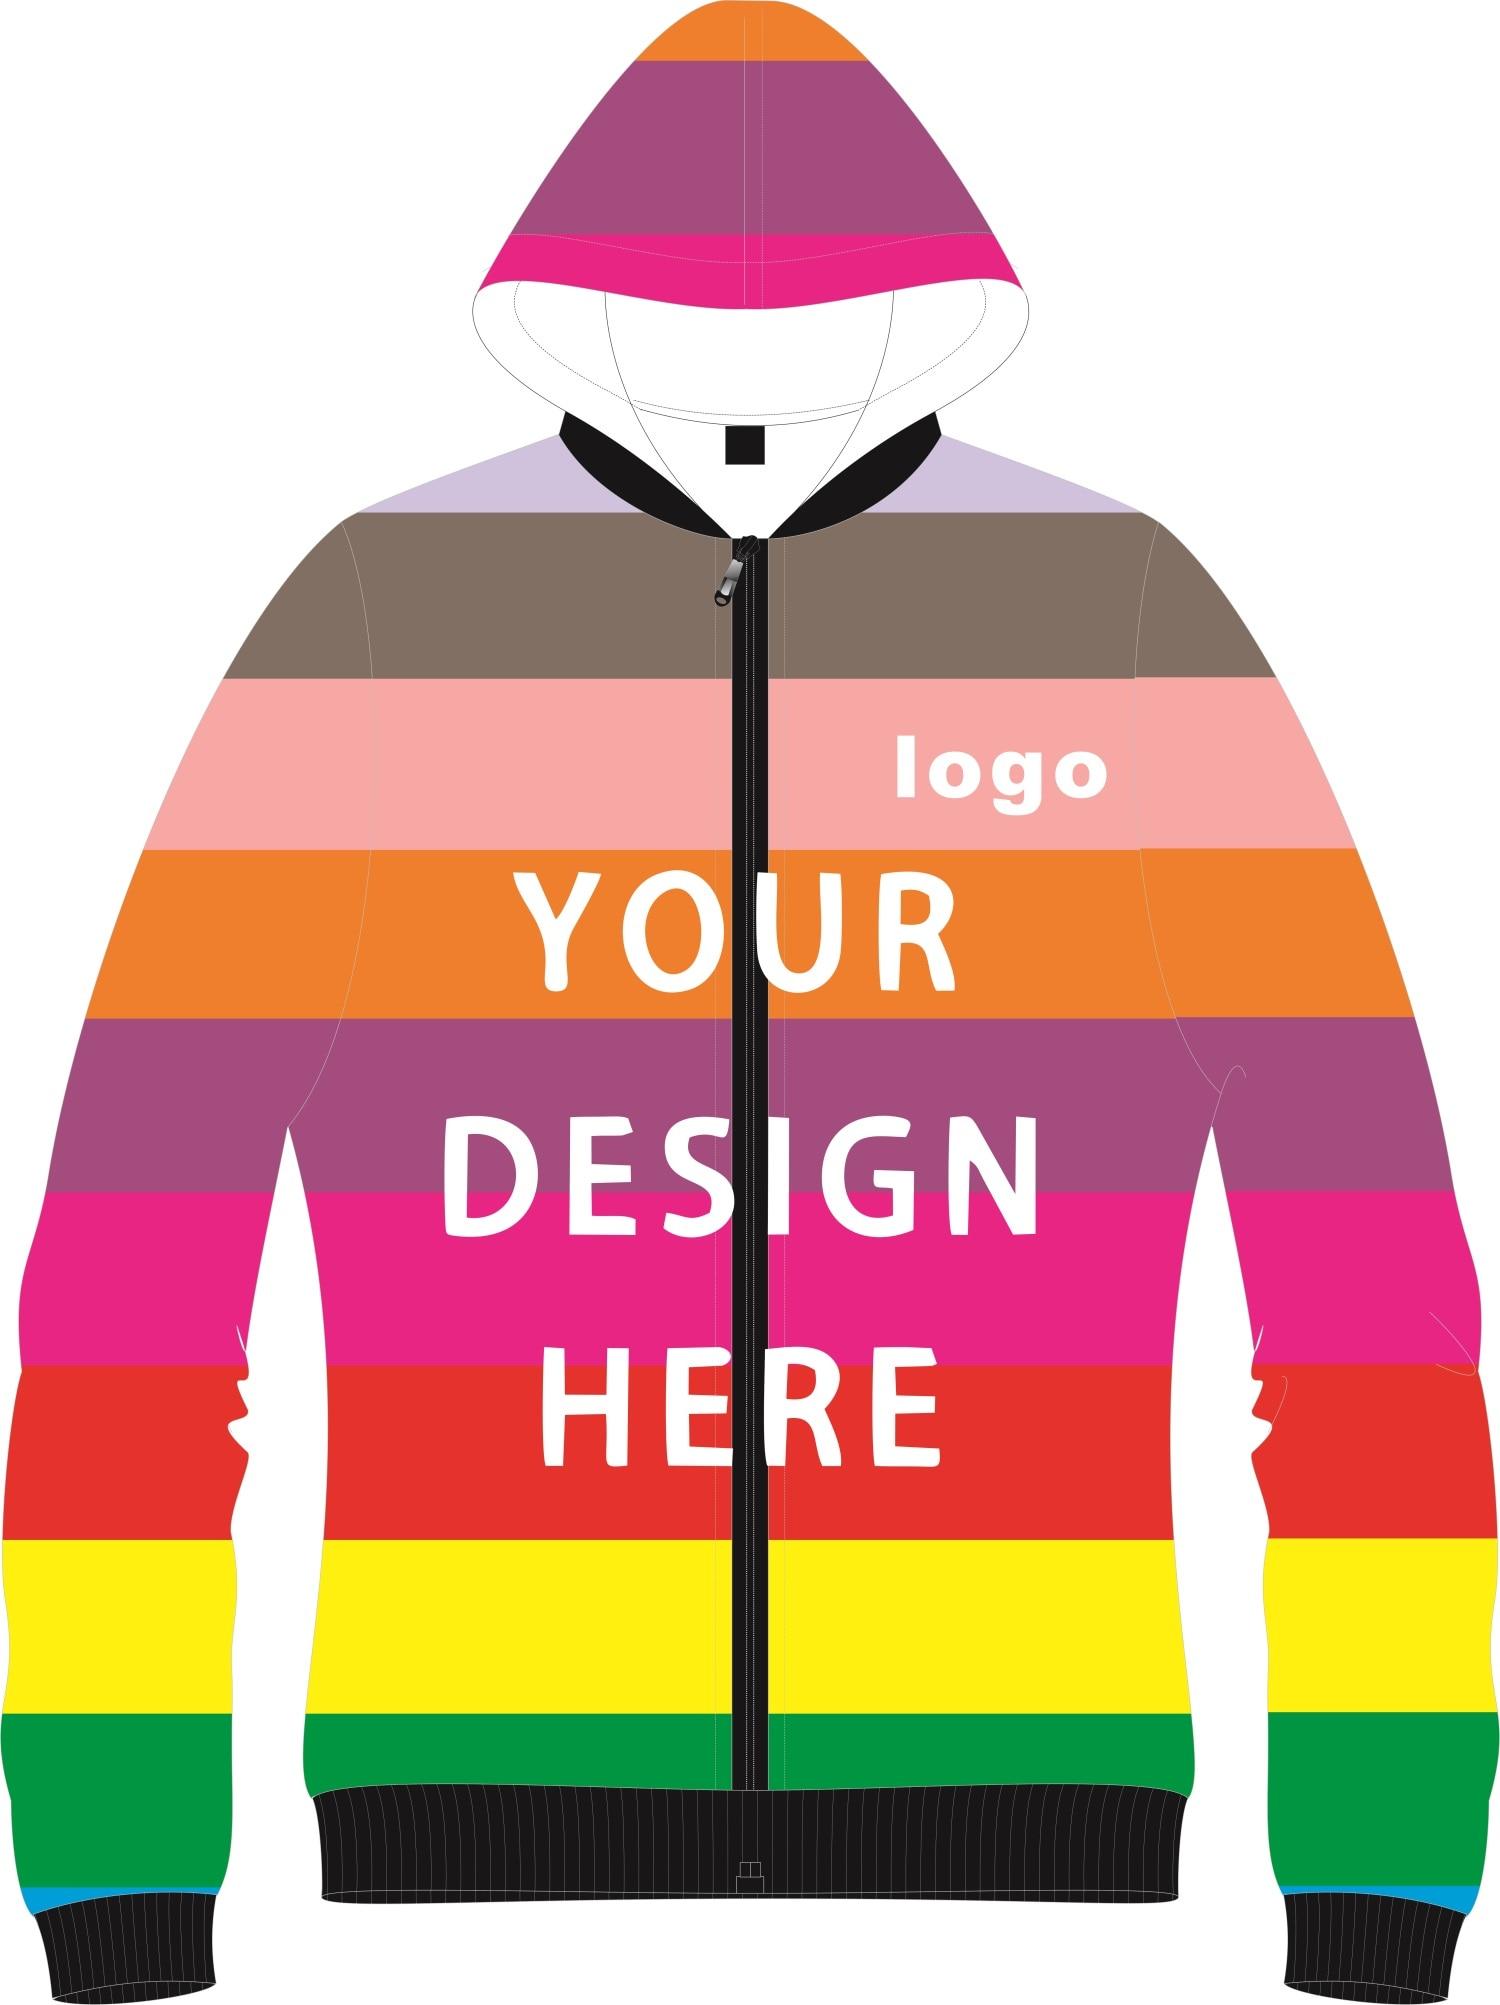 3D Print Hoodies Men Spring Autumn Own Design Logo Printing Men Women Casual Custom Fleece Spring/ Autumn Clothing